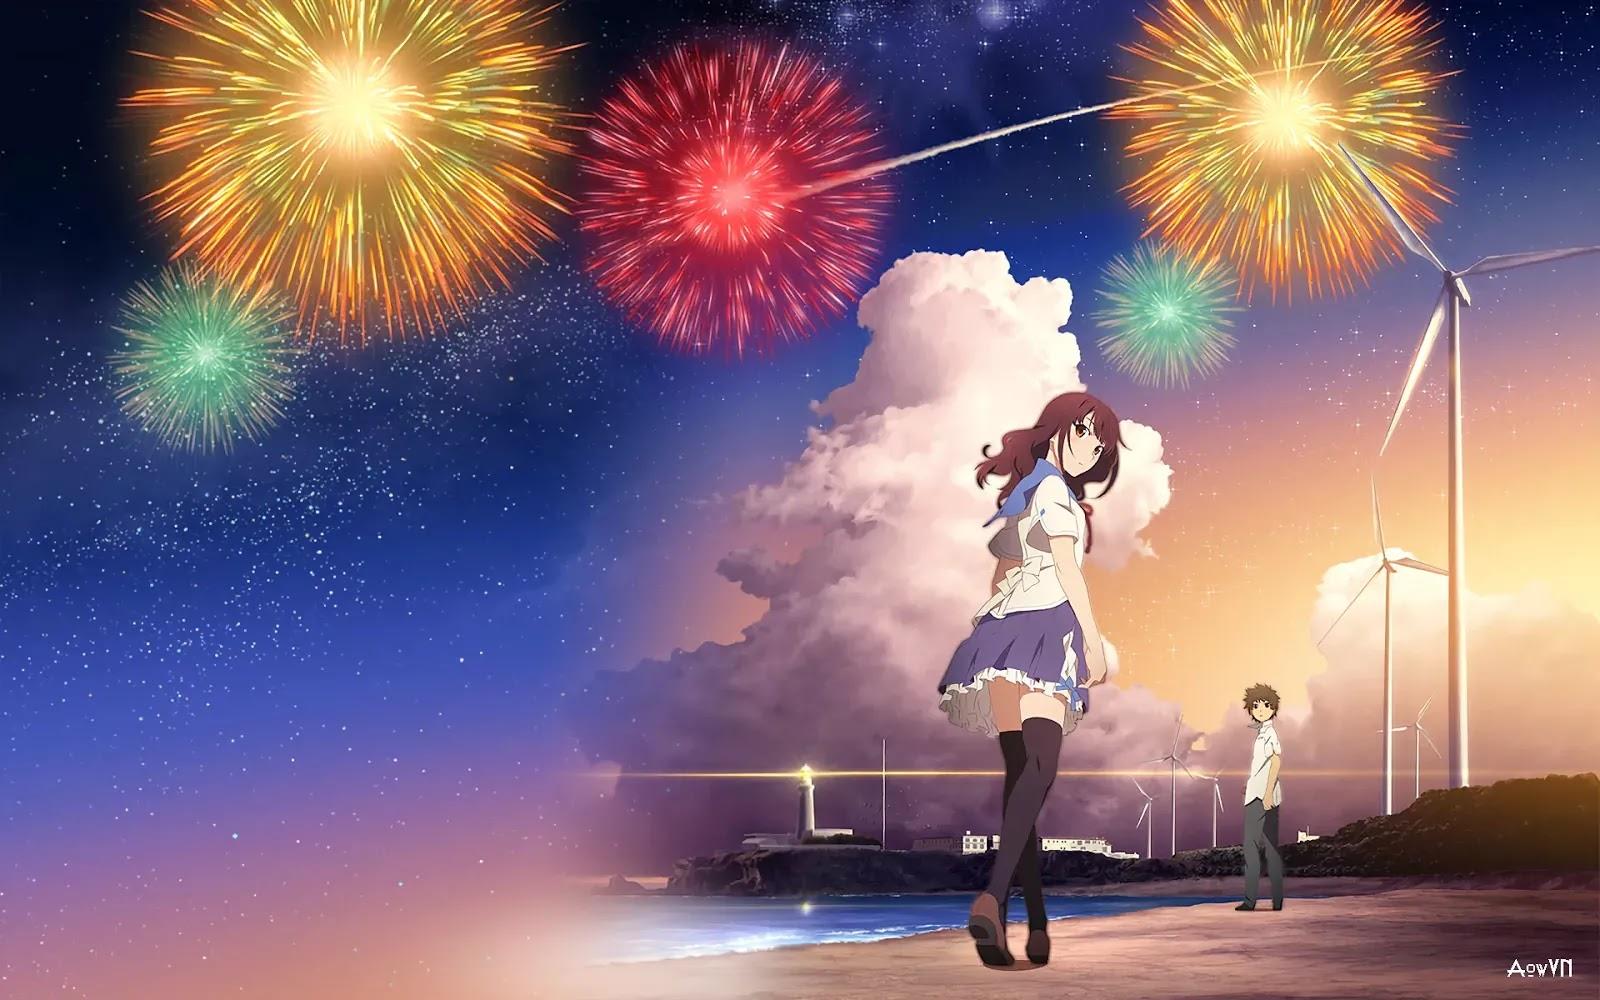 AowVN.org minz%2B%252818%2529 - [ Hình Nền ] Anime Uchiage Hanabi Shita Kara Miru Ka cực đẹp | AowVN Wallpapers